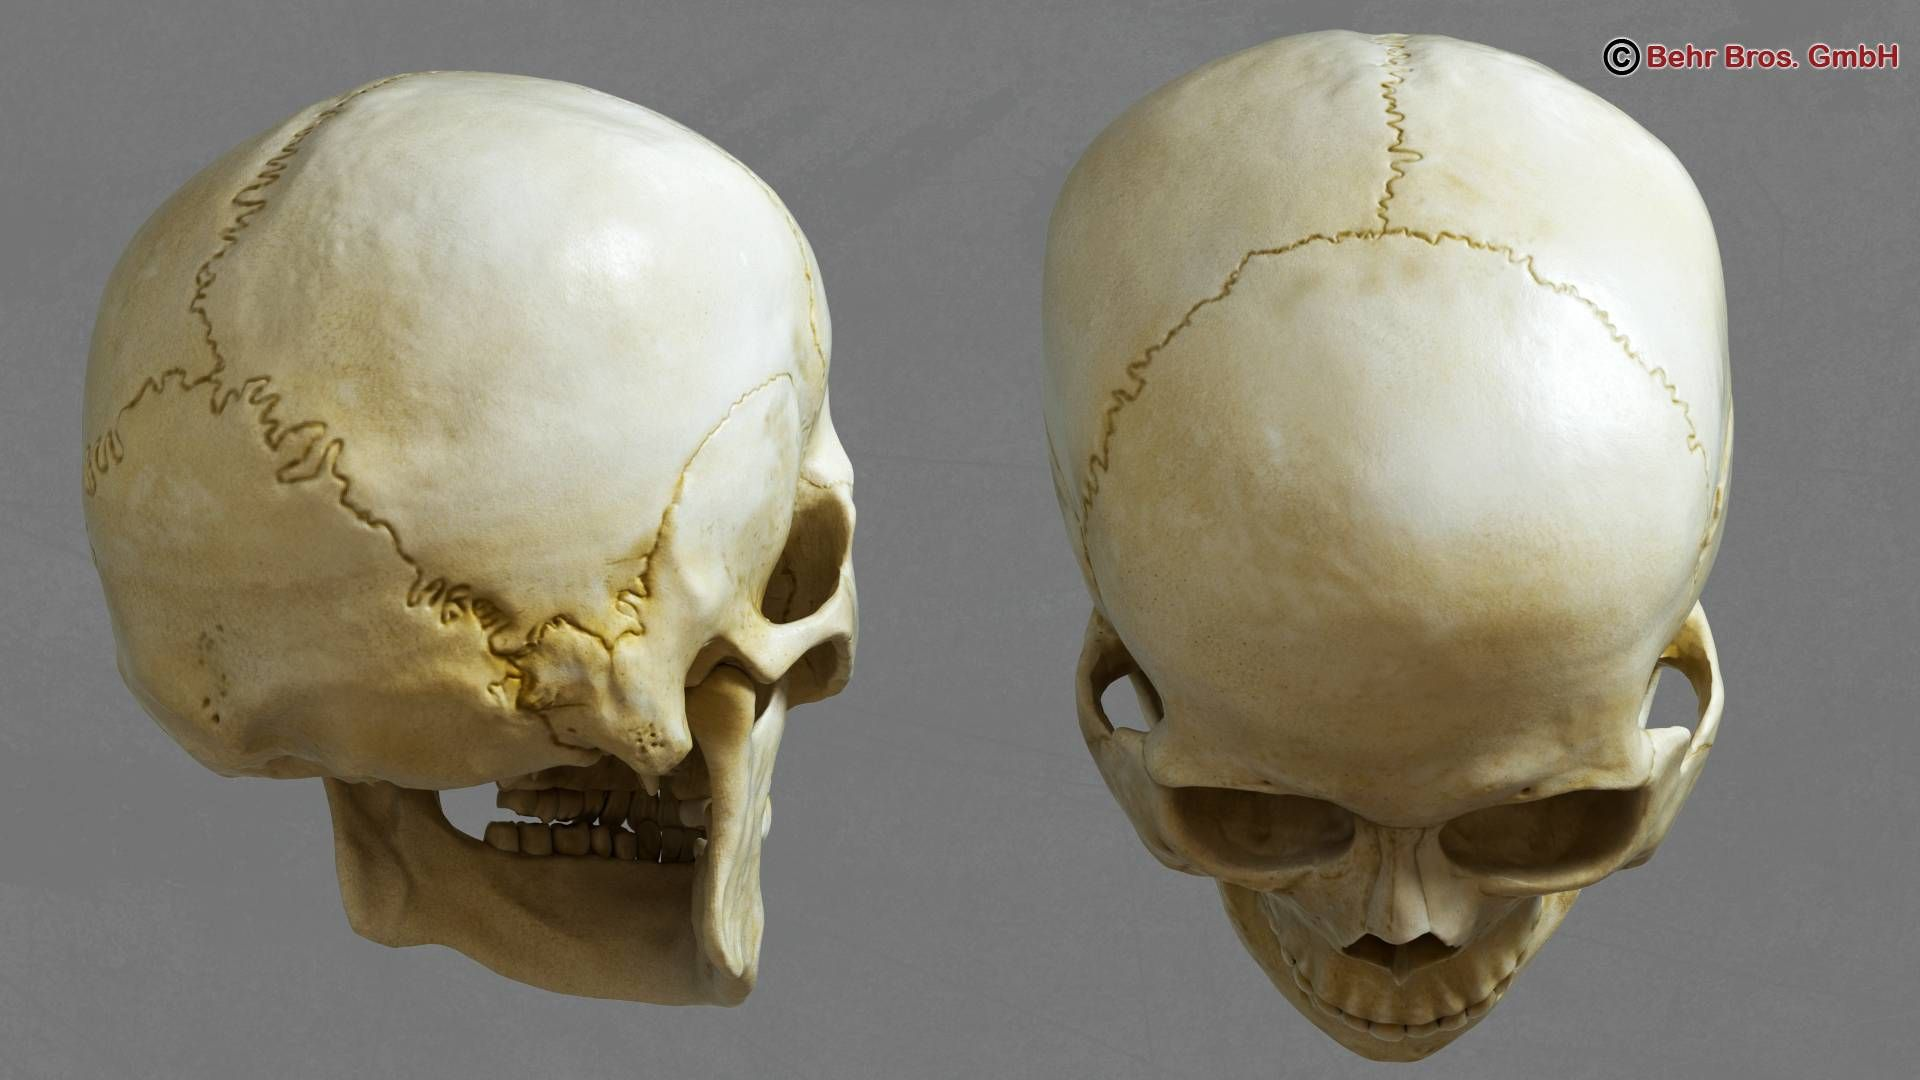 Human skull, 3/4 back and top view. Human skull, Skull